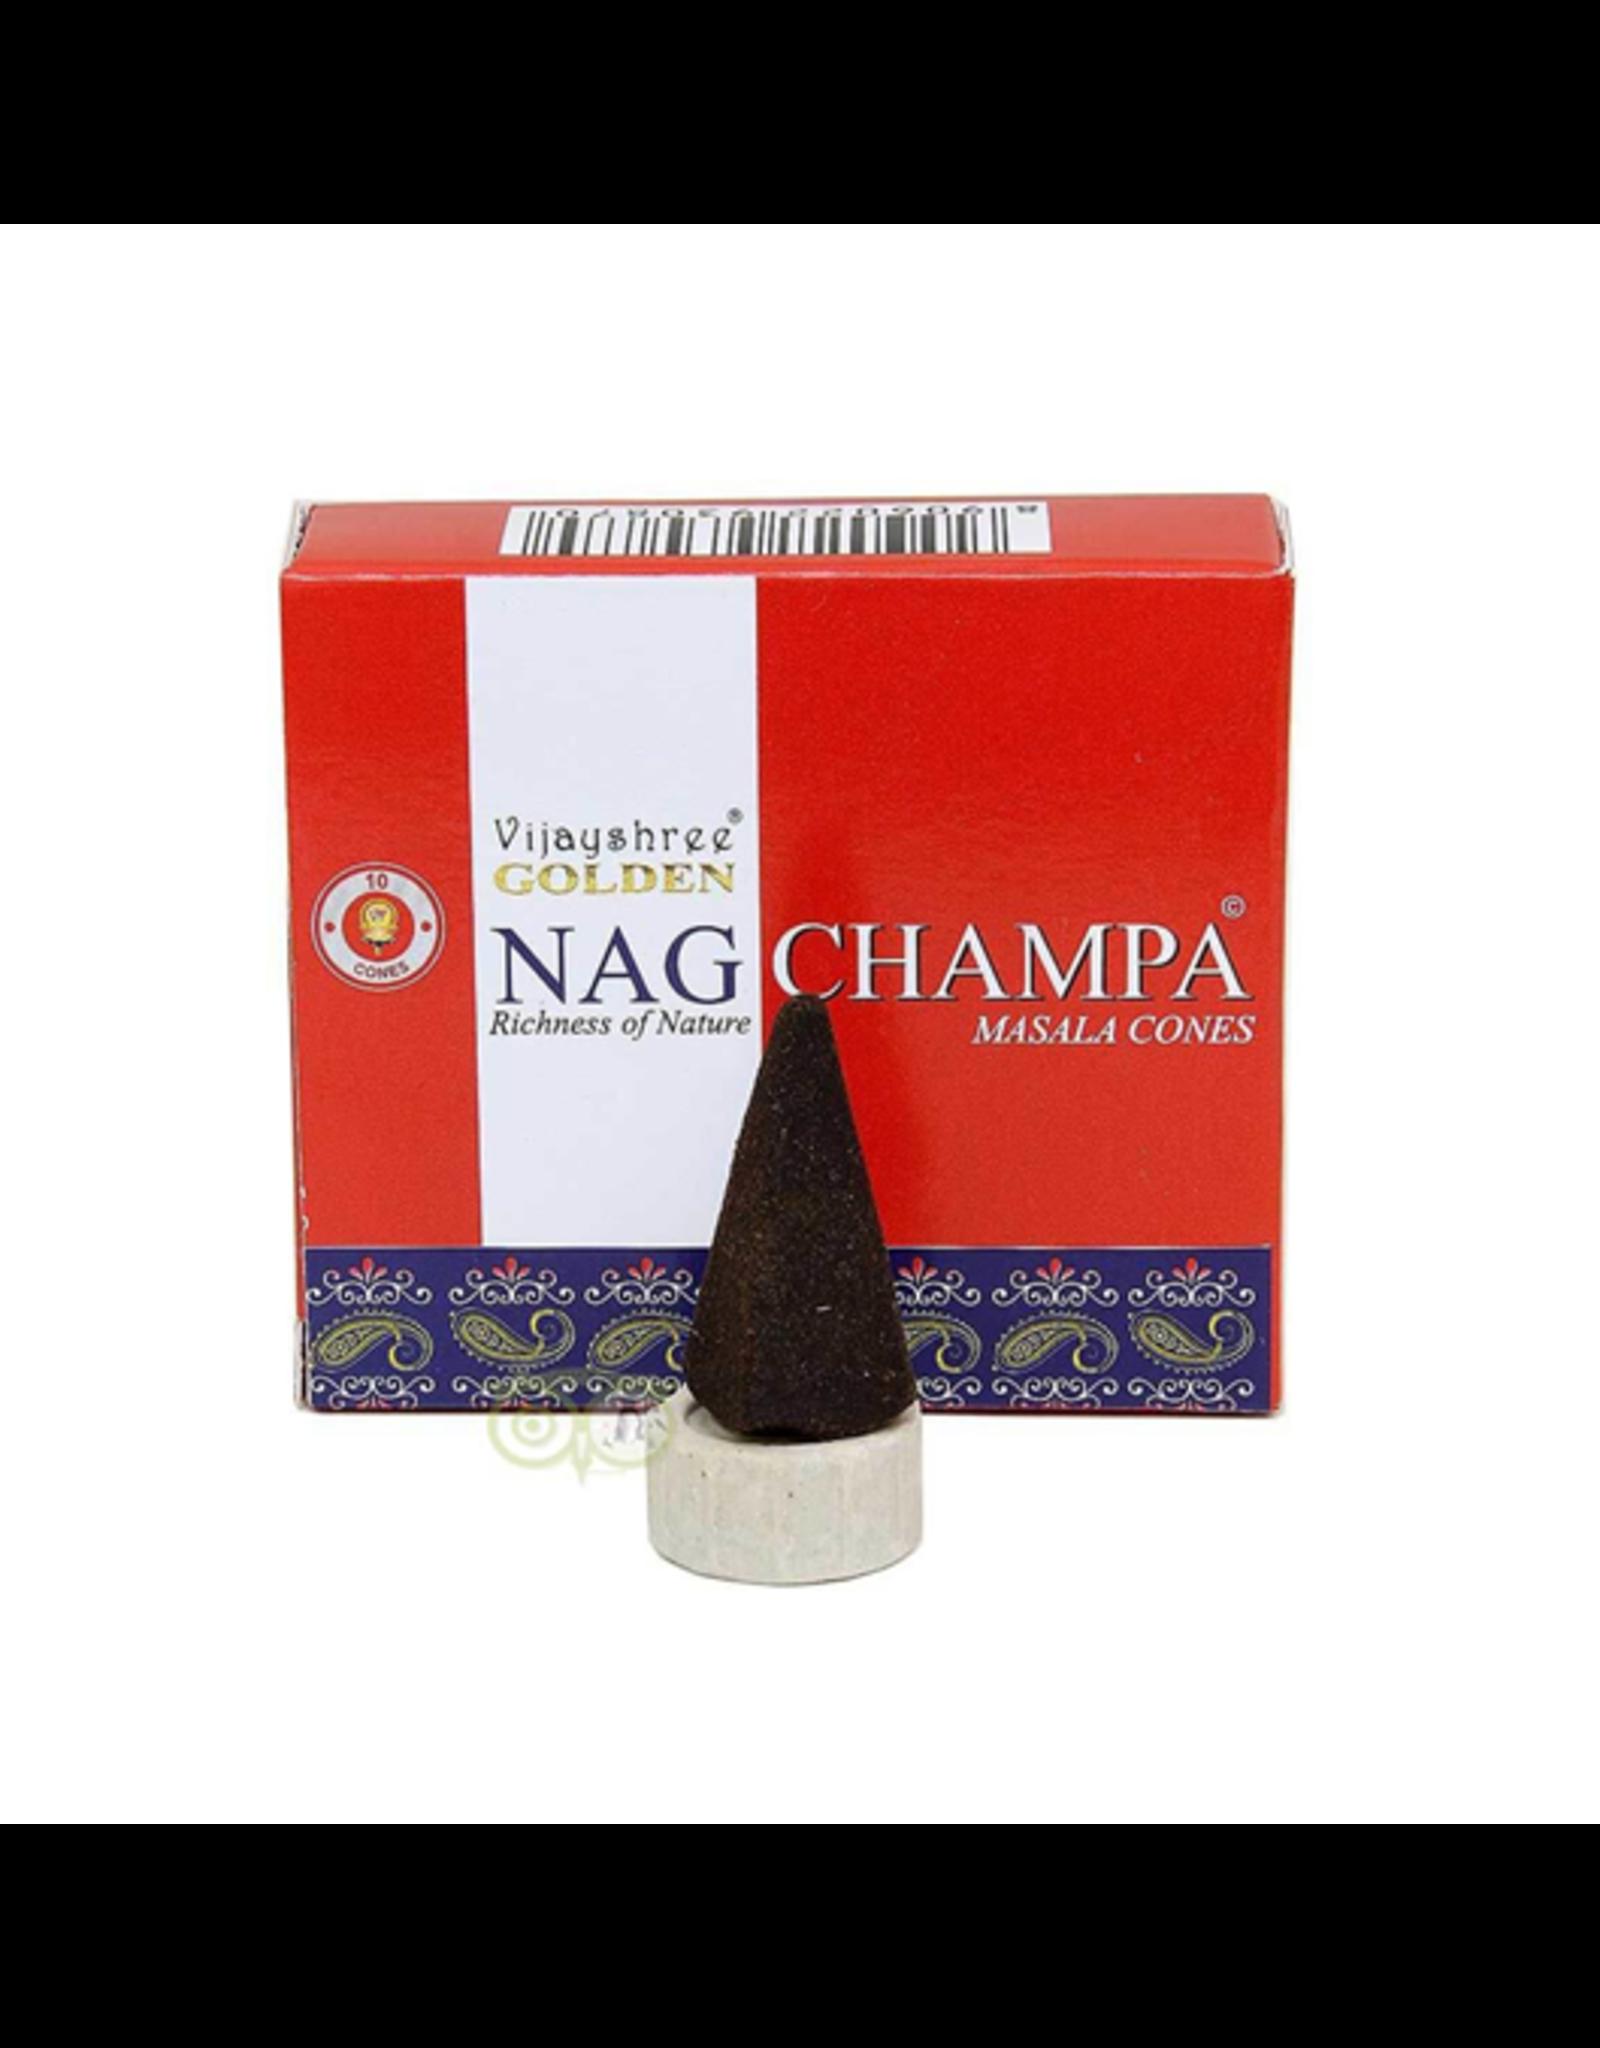 Vijayshree Golden Nag Champa cones